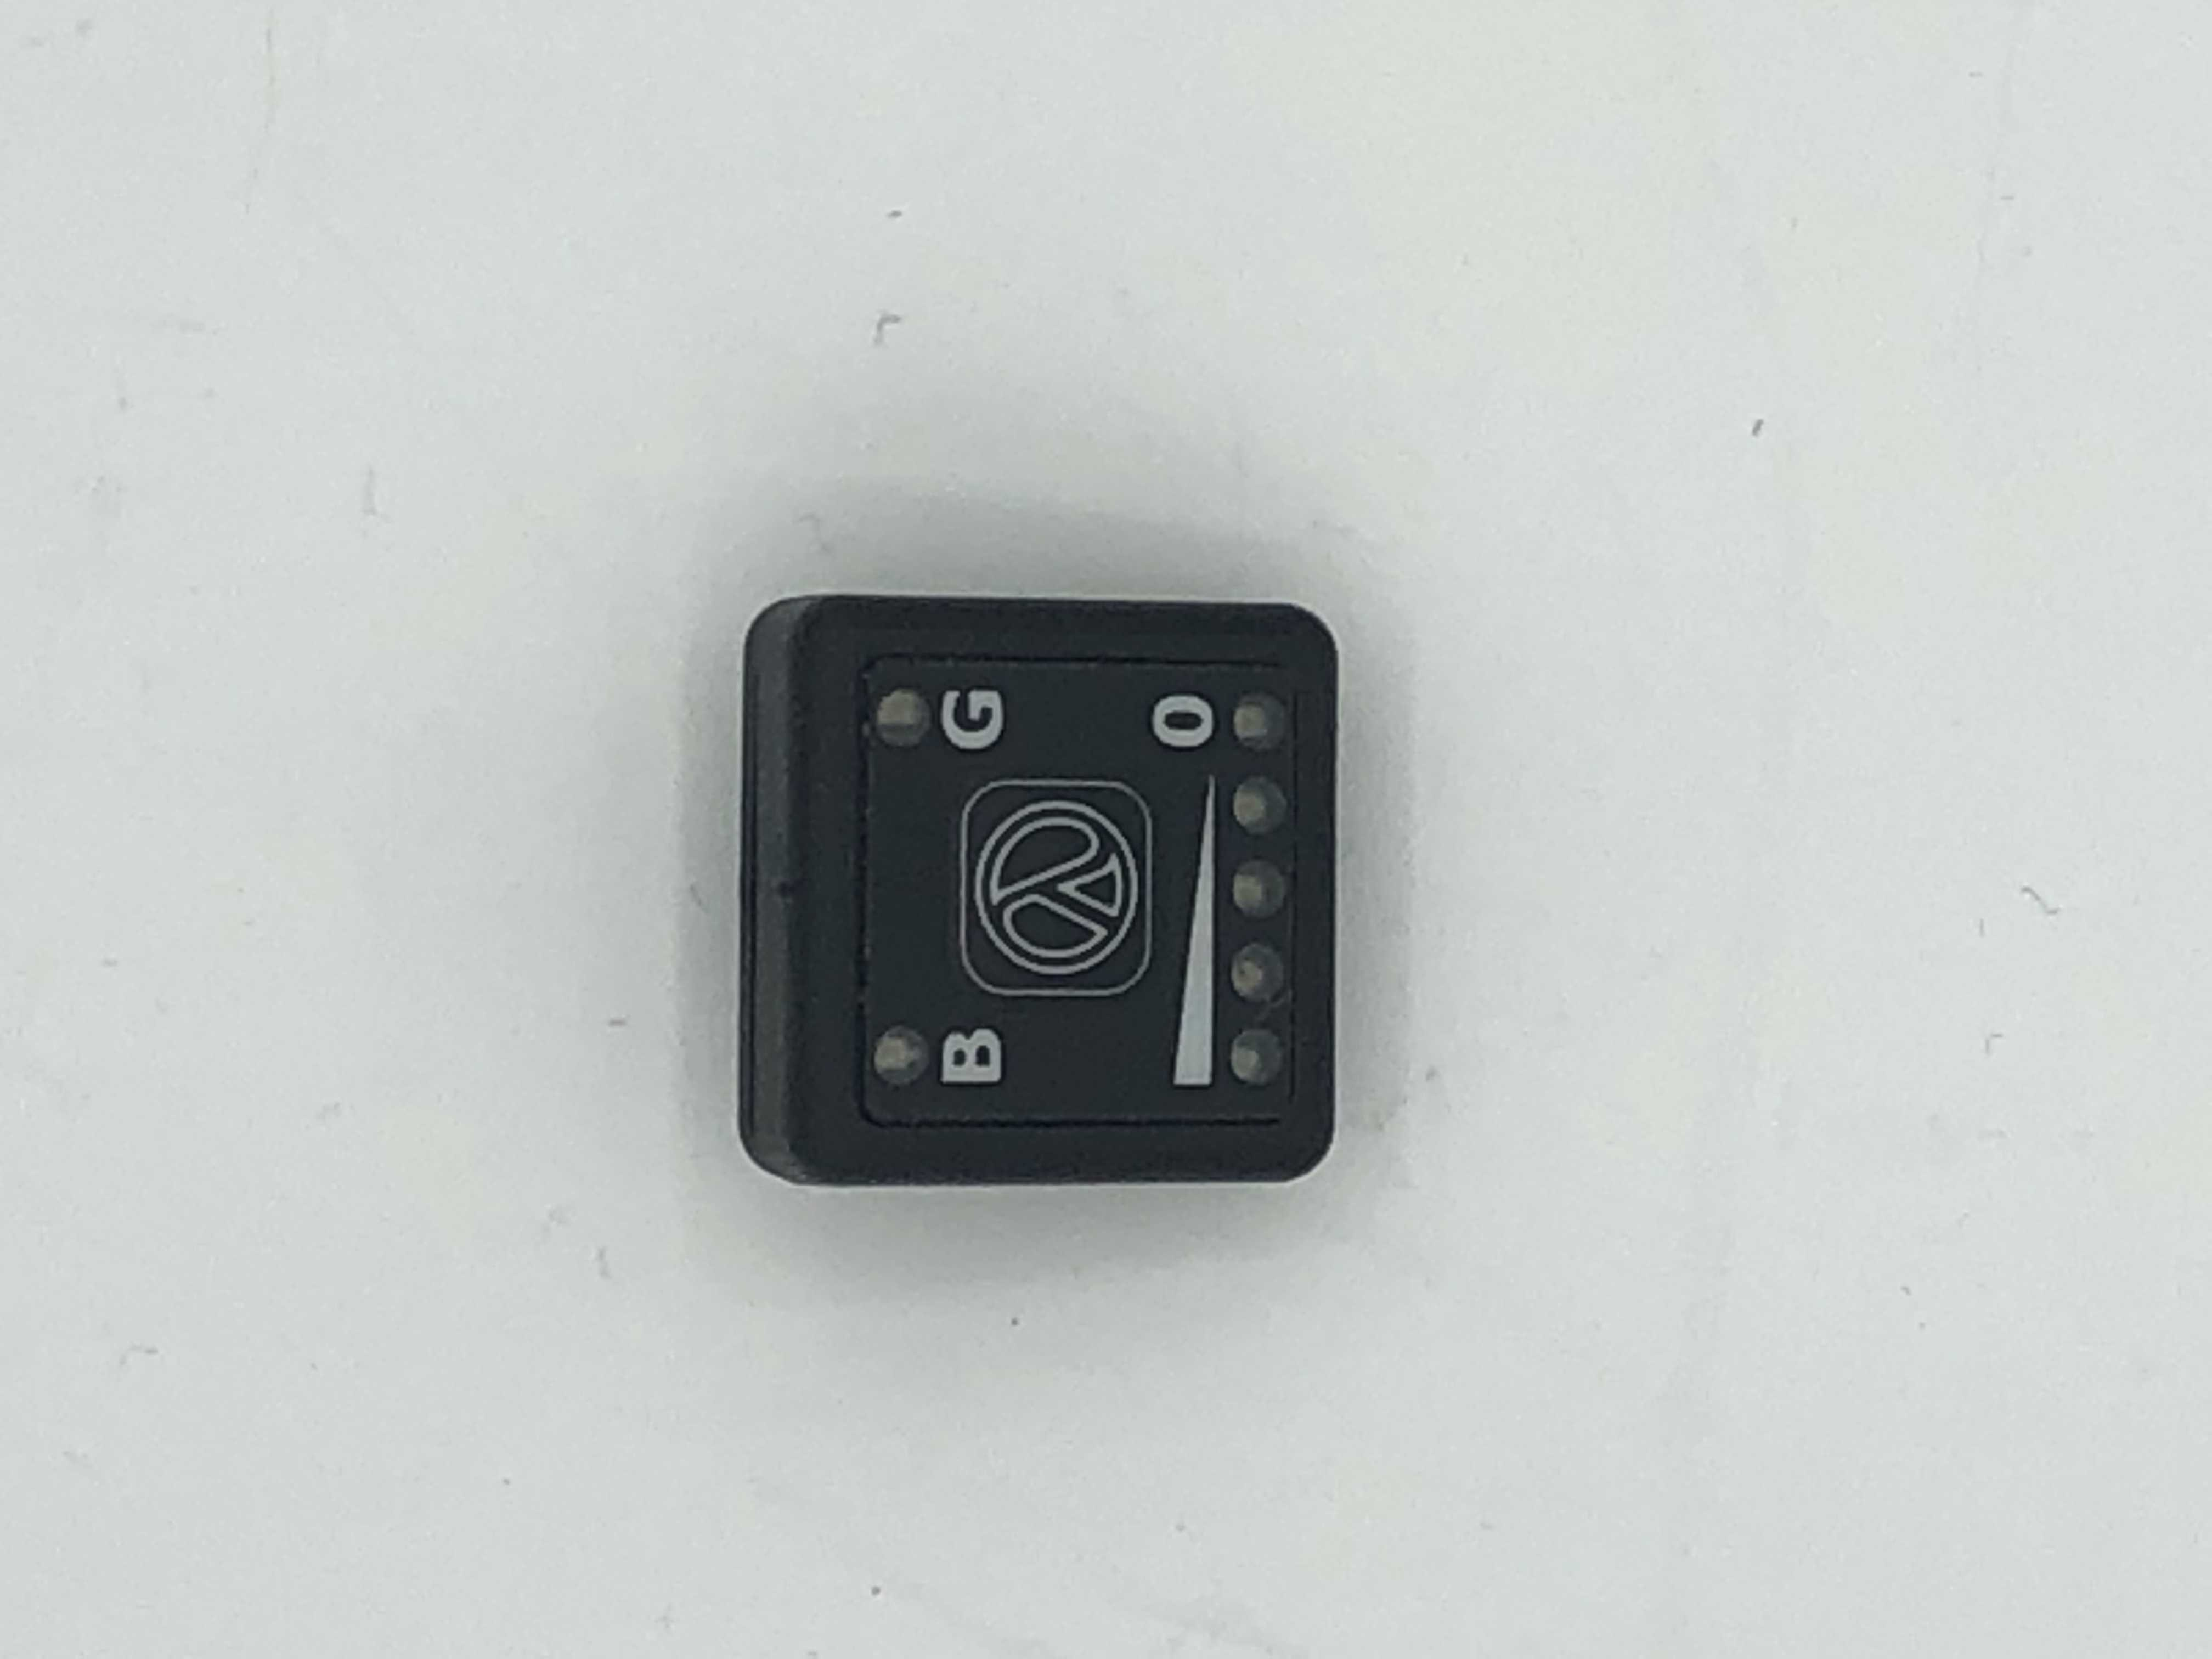 Magnetspule für ÖCOTEC  Verdampfer am Absperrventil